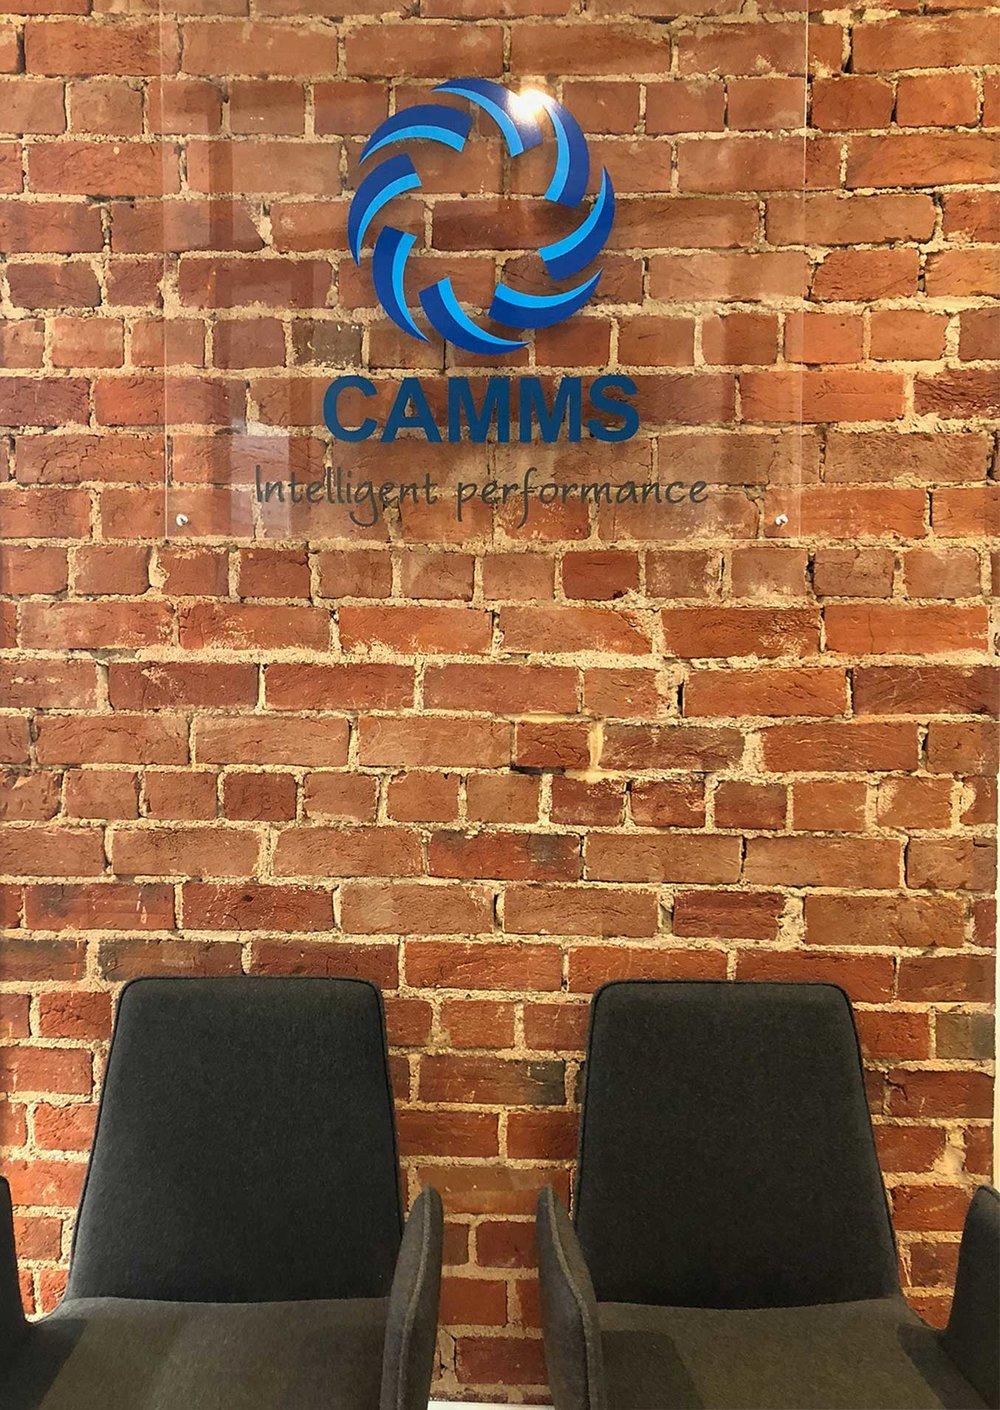 CAMMS_brick-wall-signmaybe.jpg